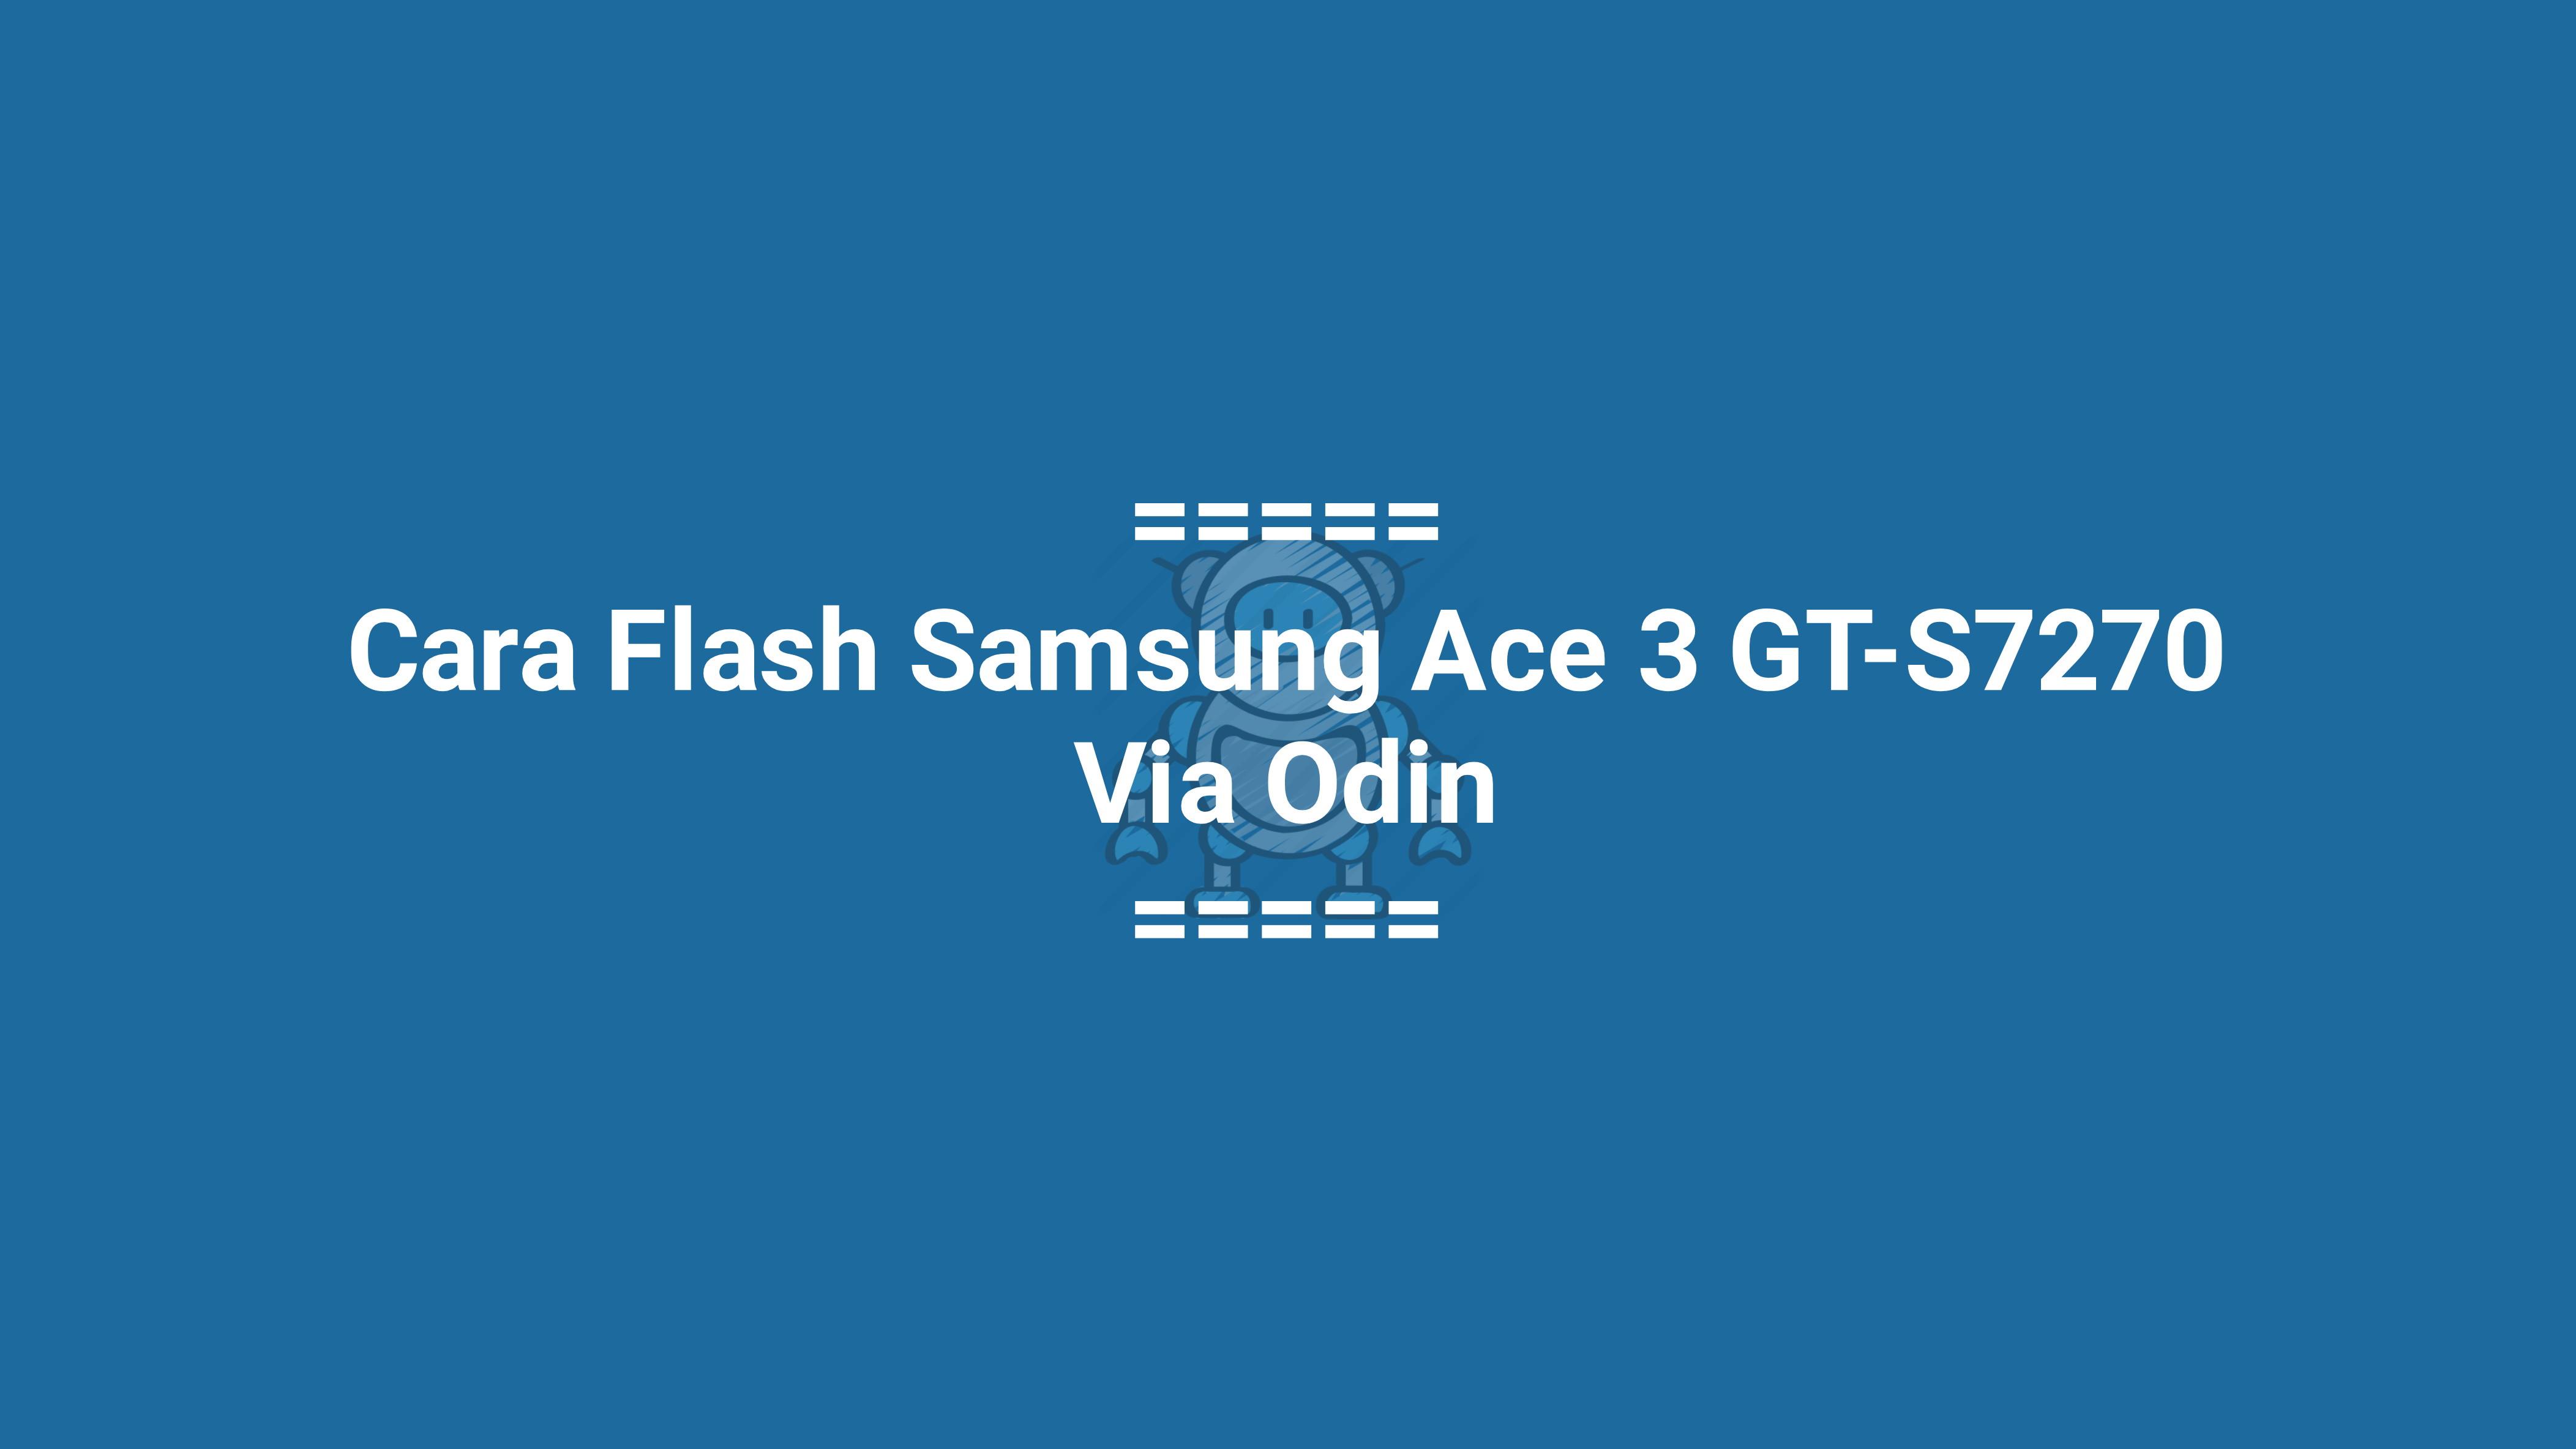 Cara Flash Samsung Ace 3 GT-S7270